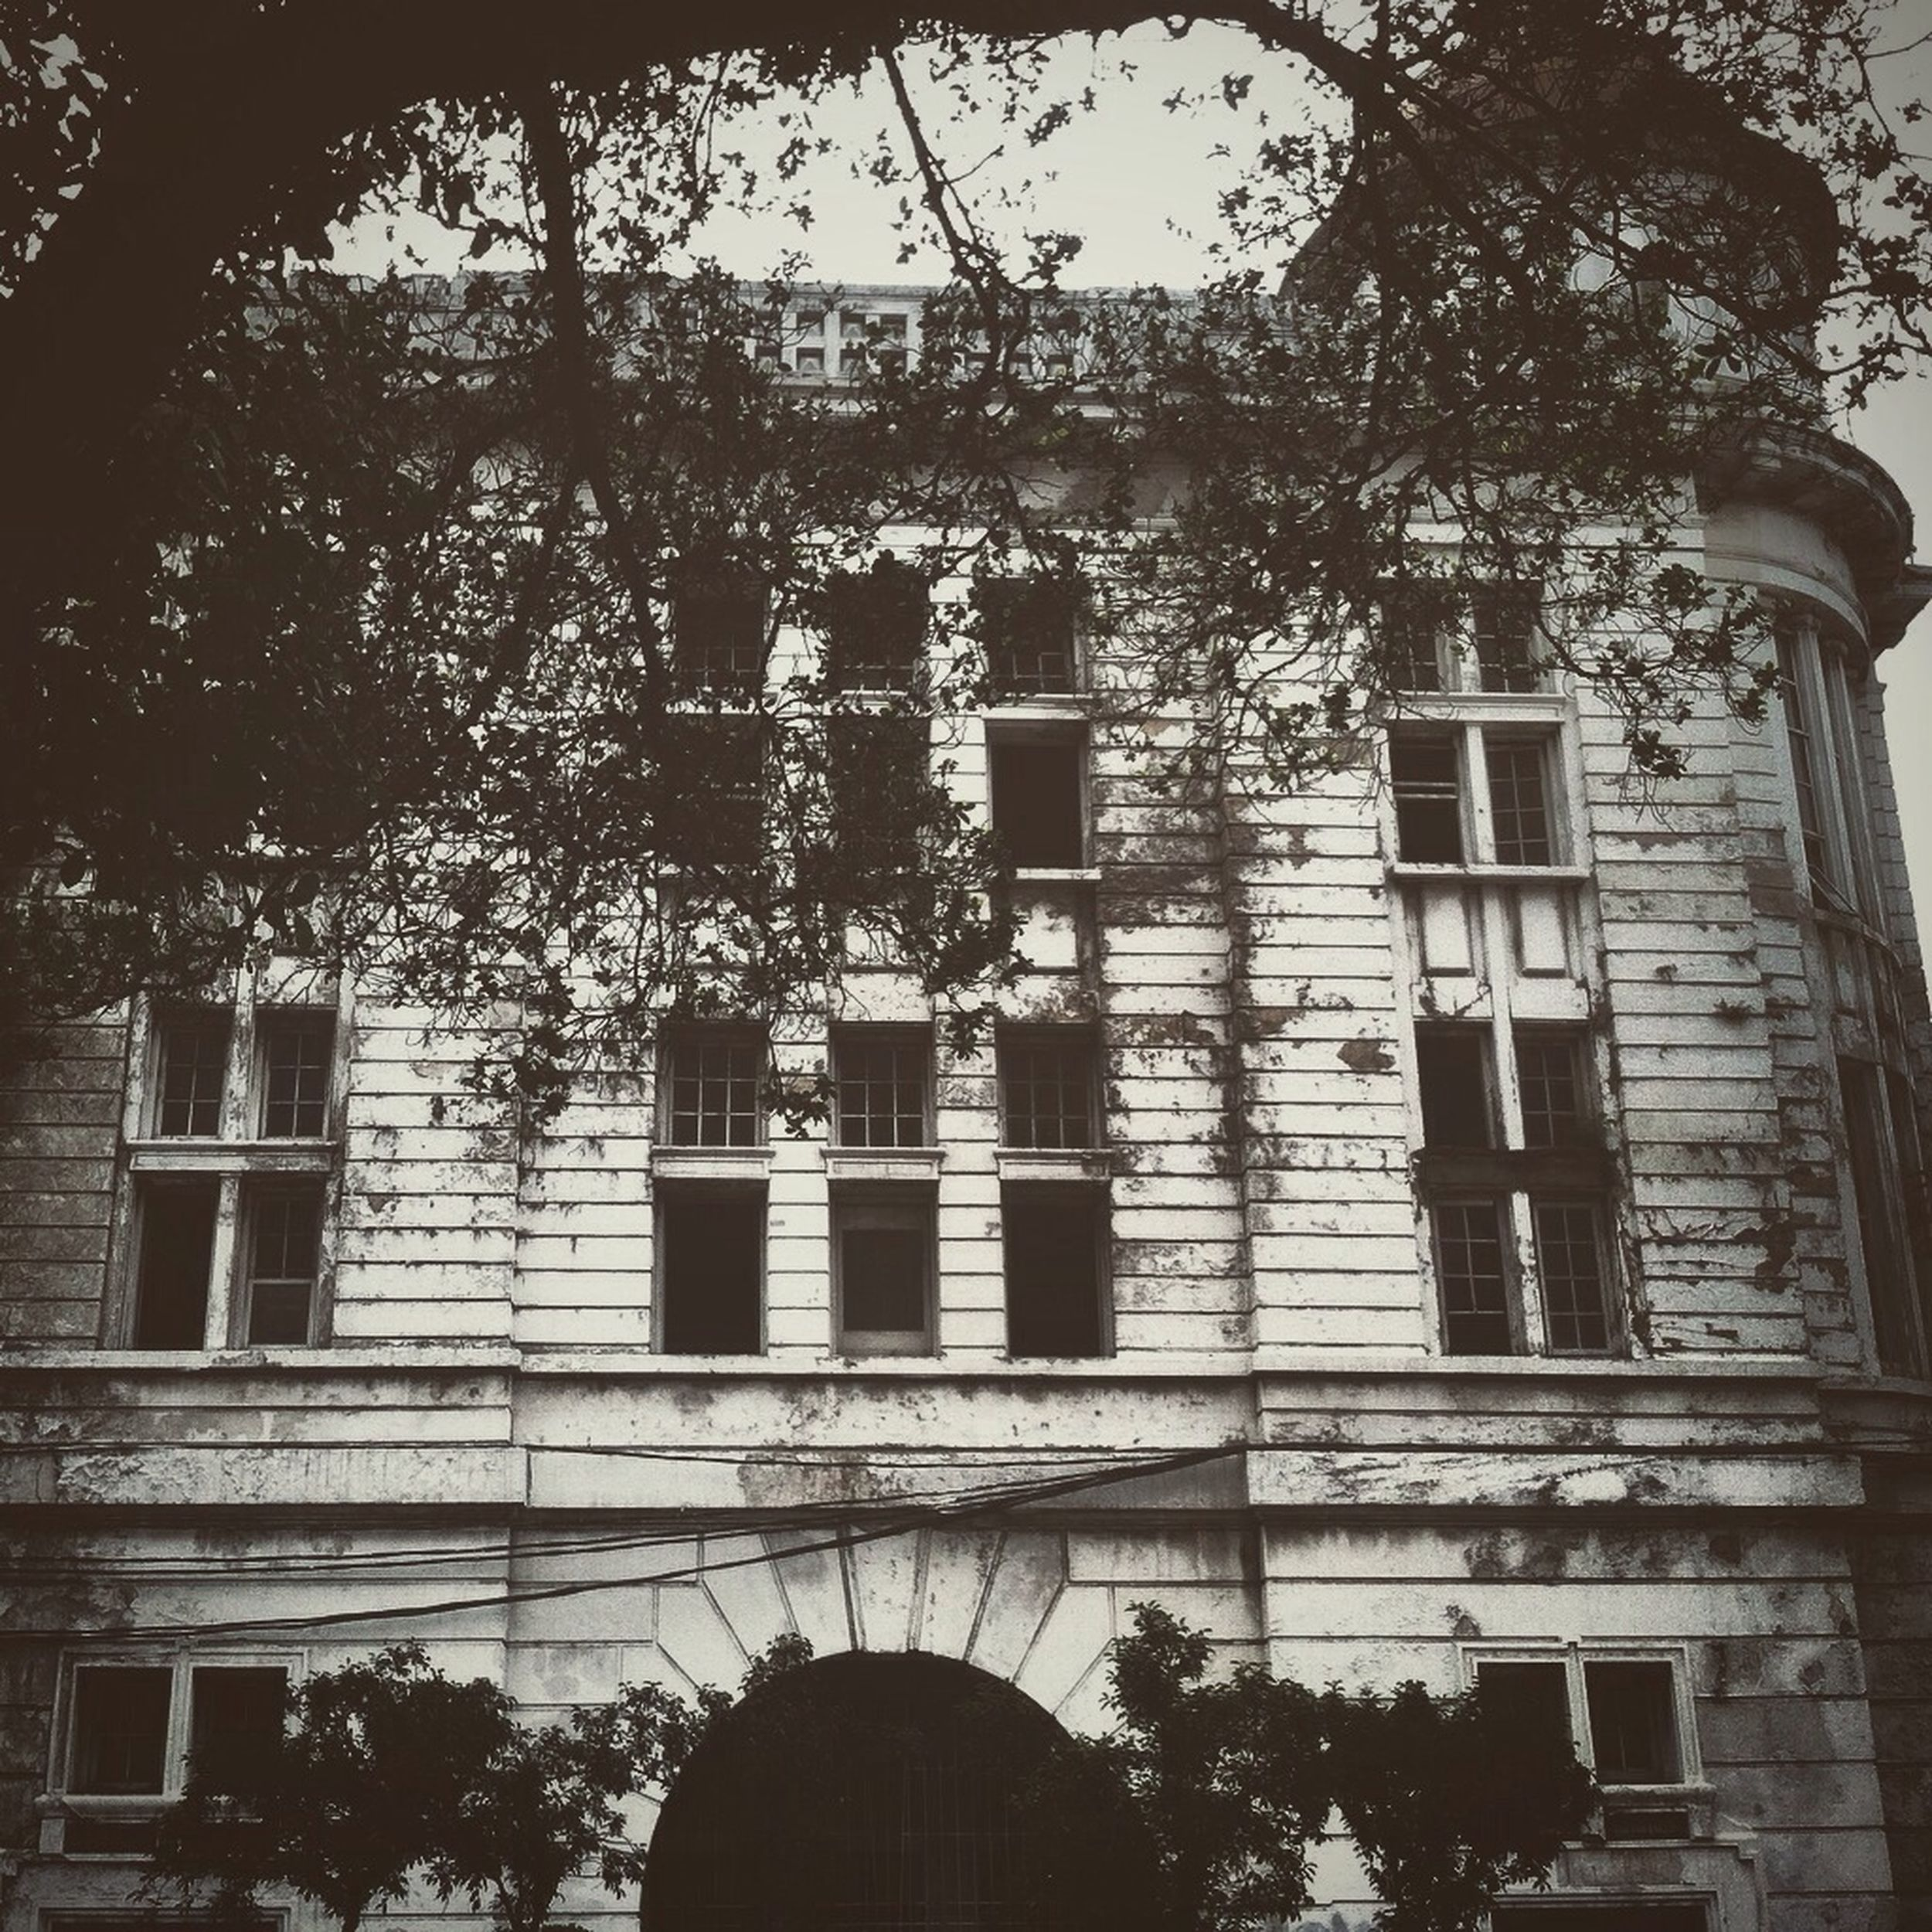 Streetphotography Blackandwhite Building School Flow